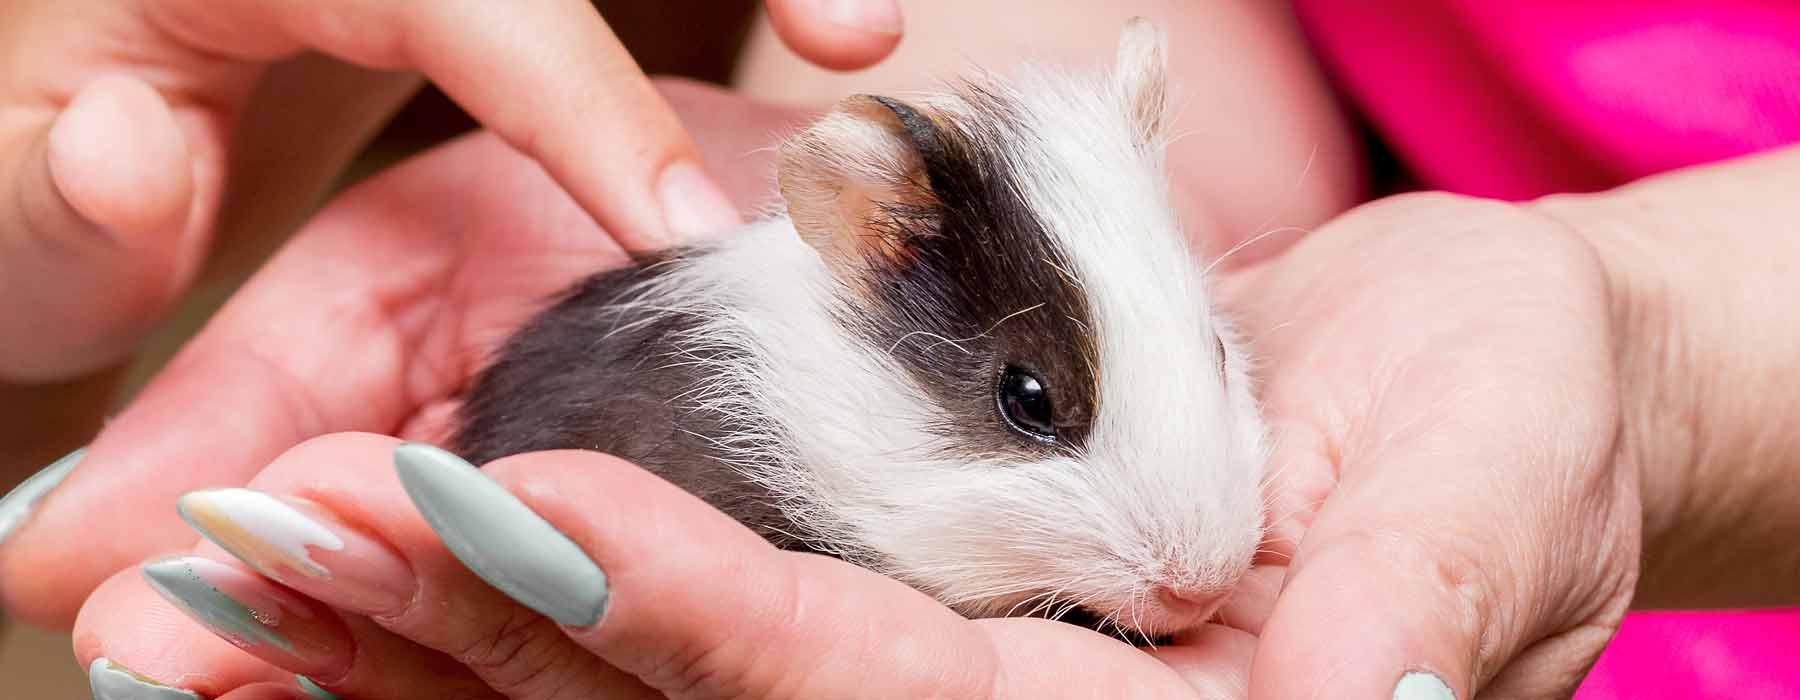 baby guinea pig in girl's hand